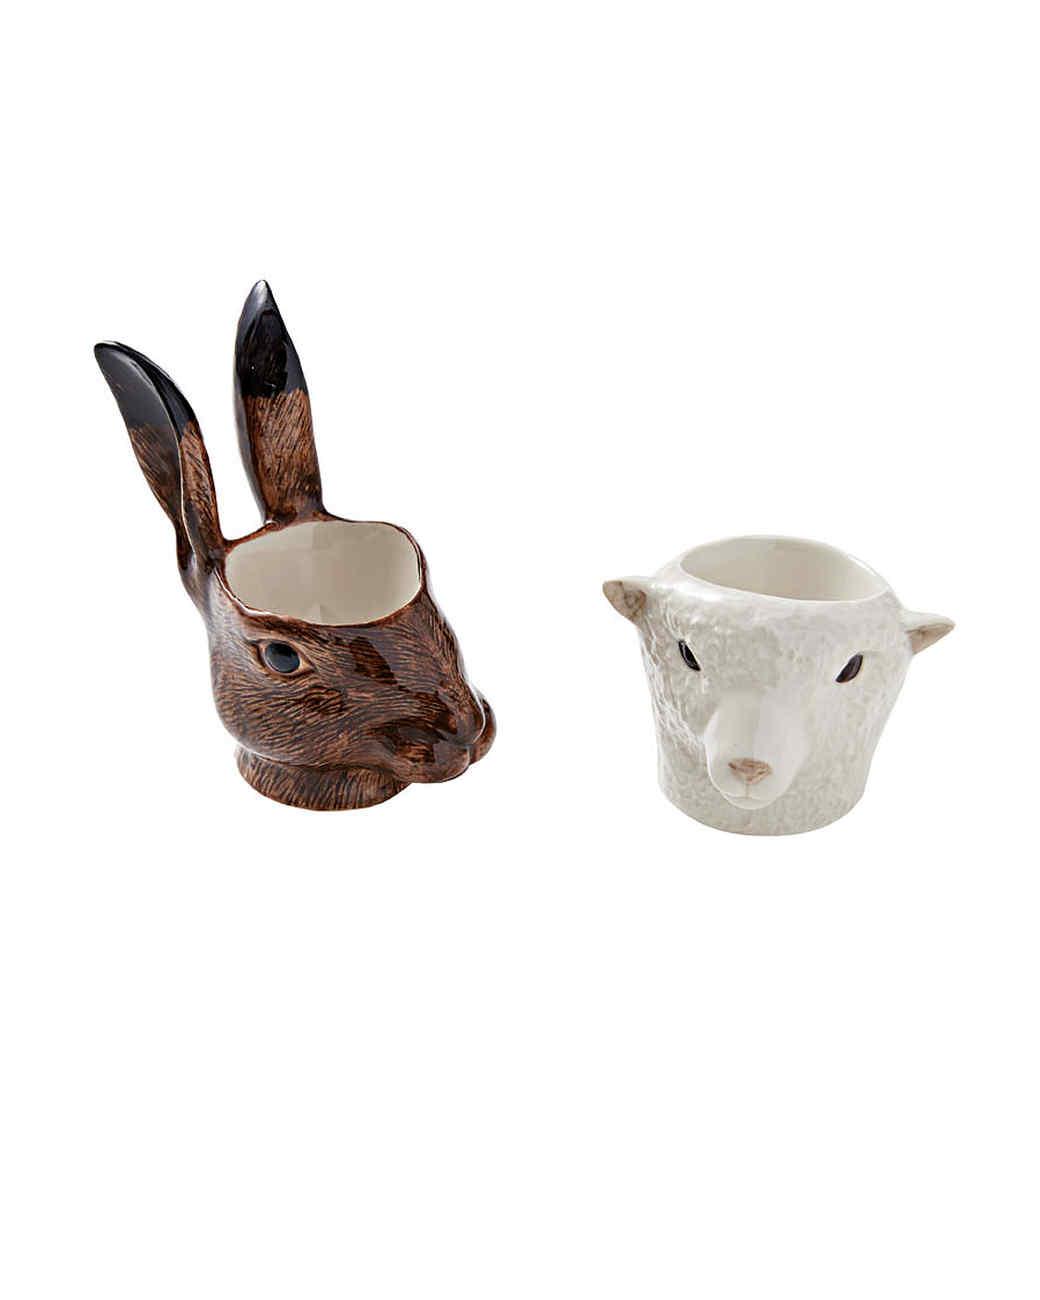 quall-egg-cups-rabbit-087-d112856_l.jpg